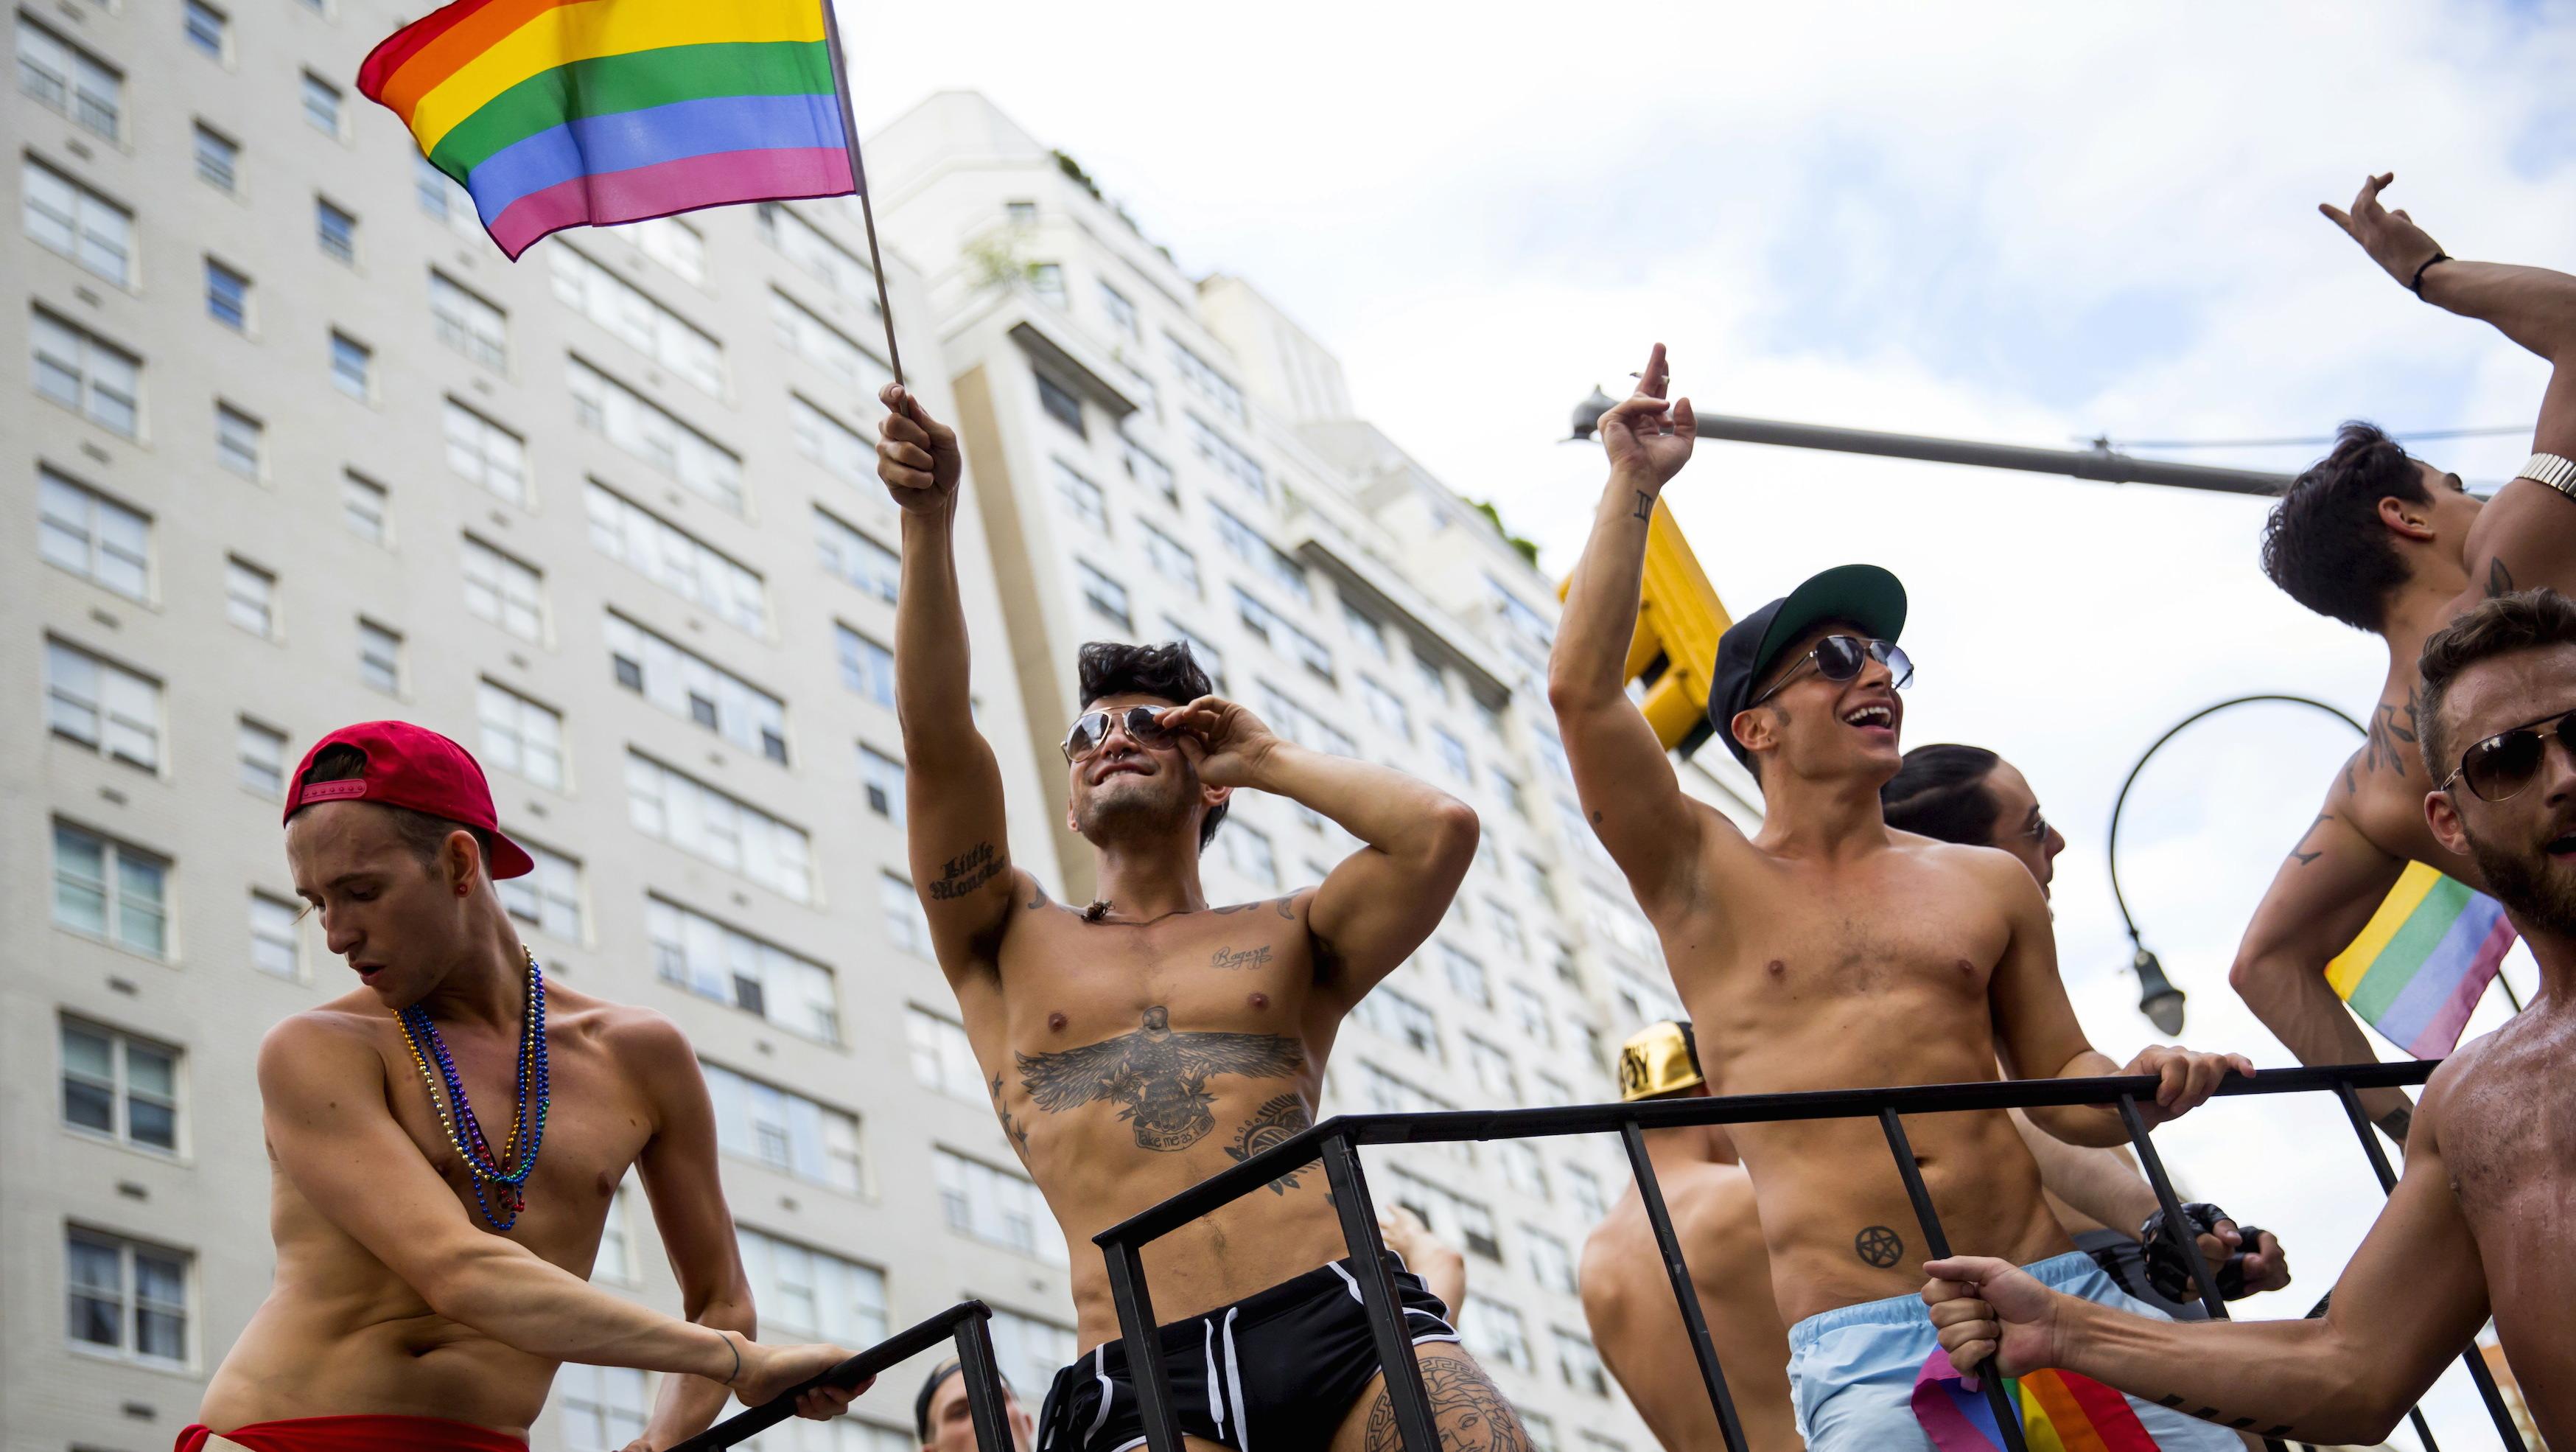 Latin elite gay